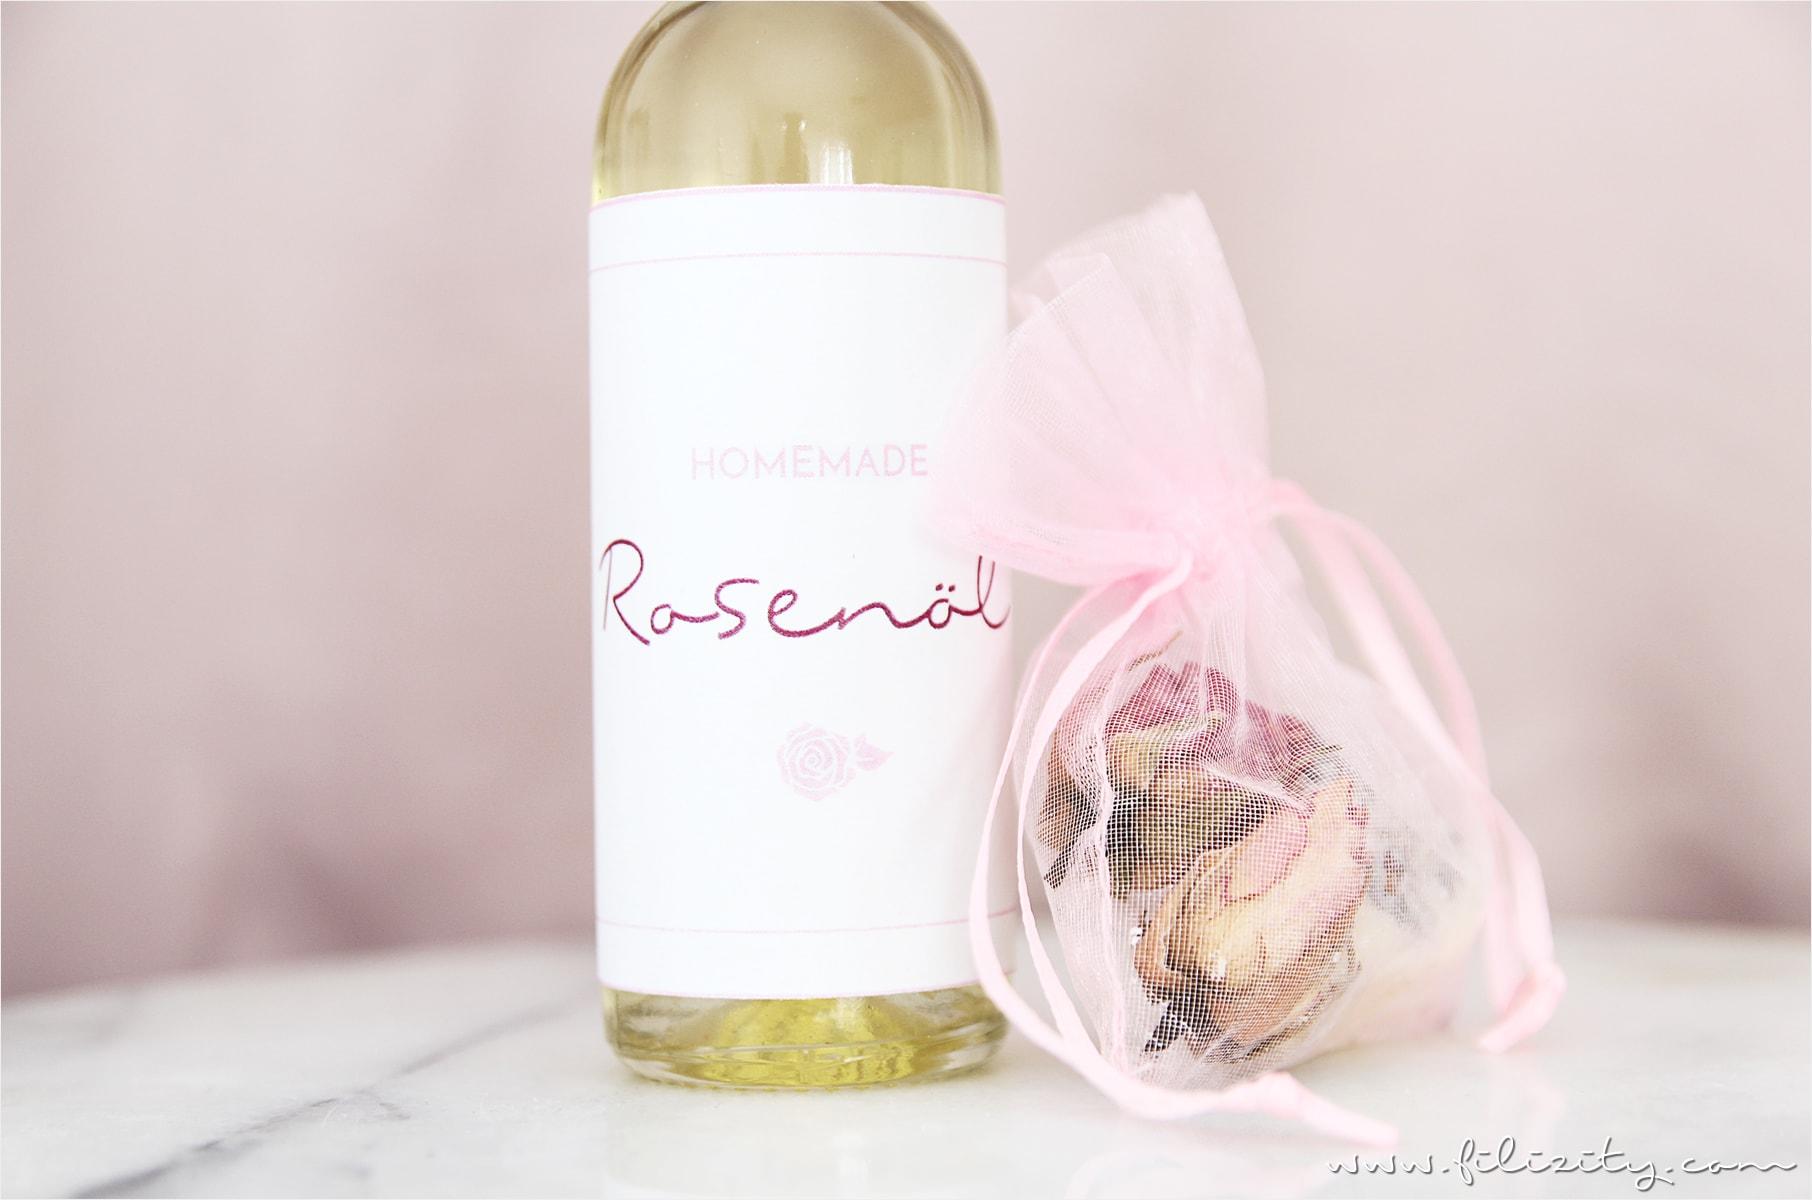 beauty_diy_rosenoel_rose-body-oil_koerper-oel_haut-pflege_valentinstag-geschenk0-min